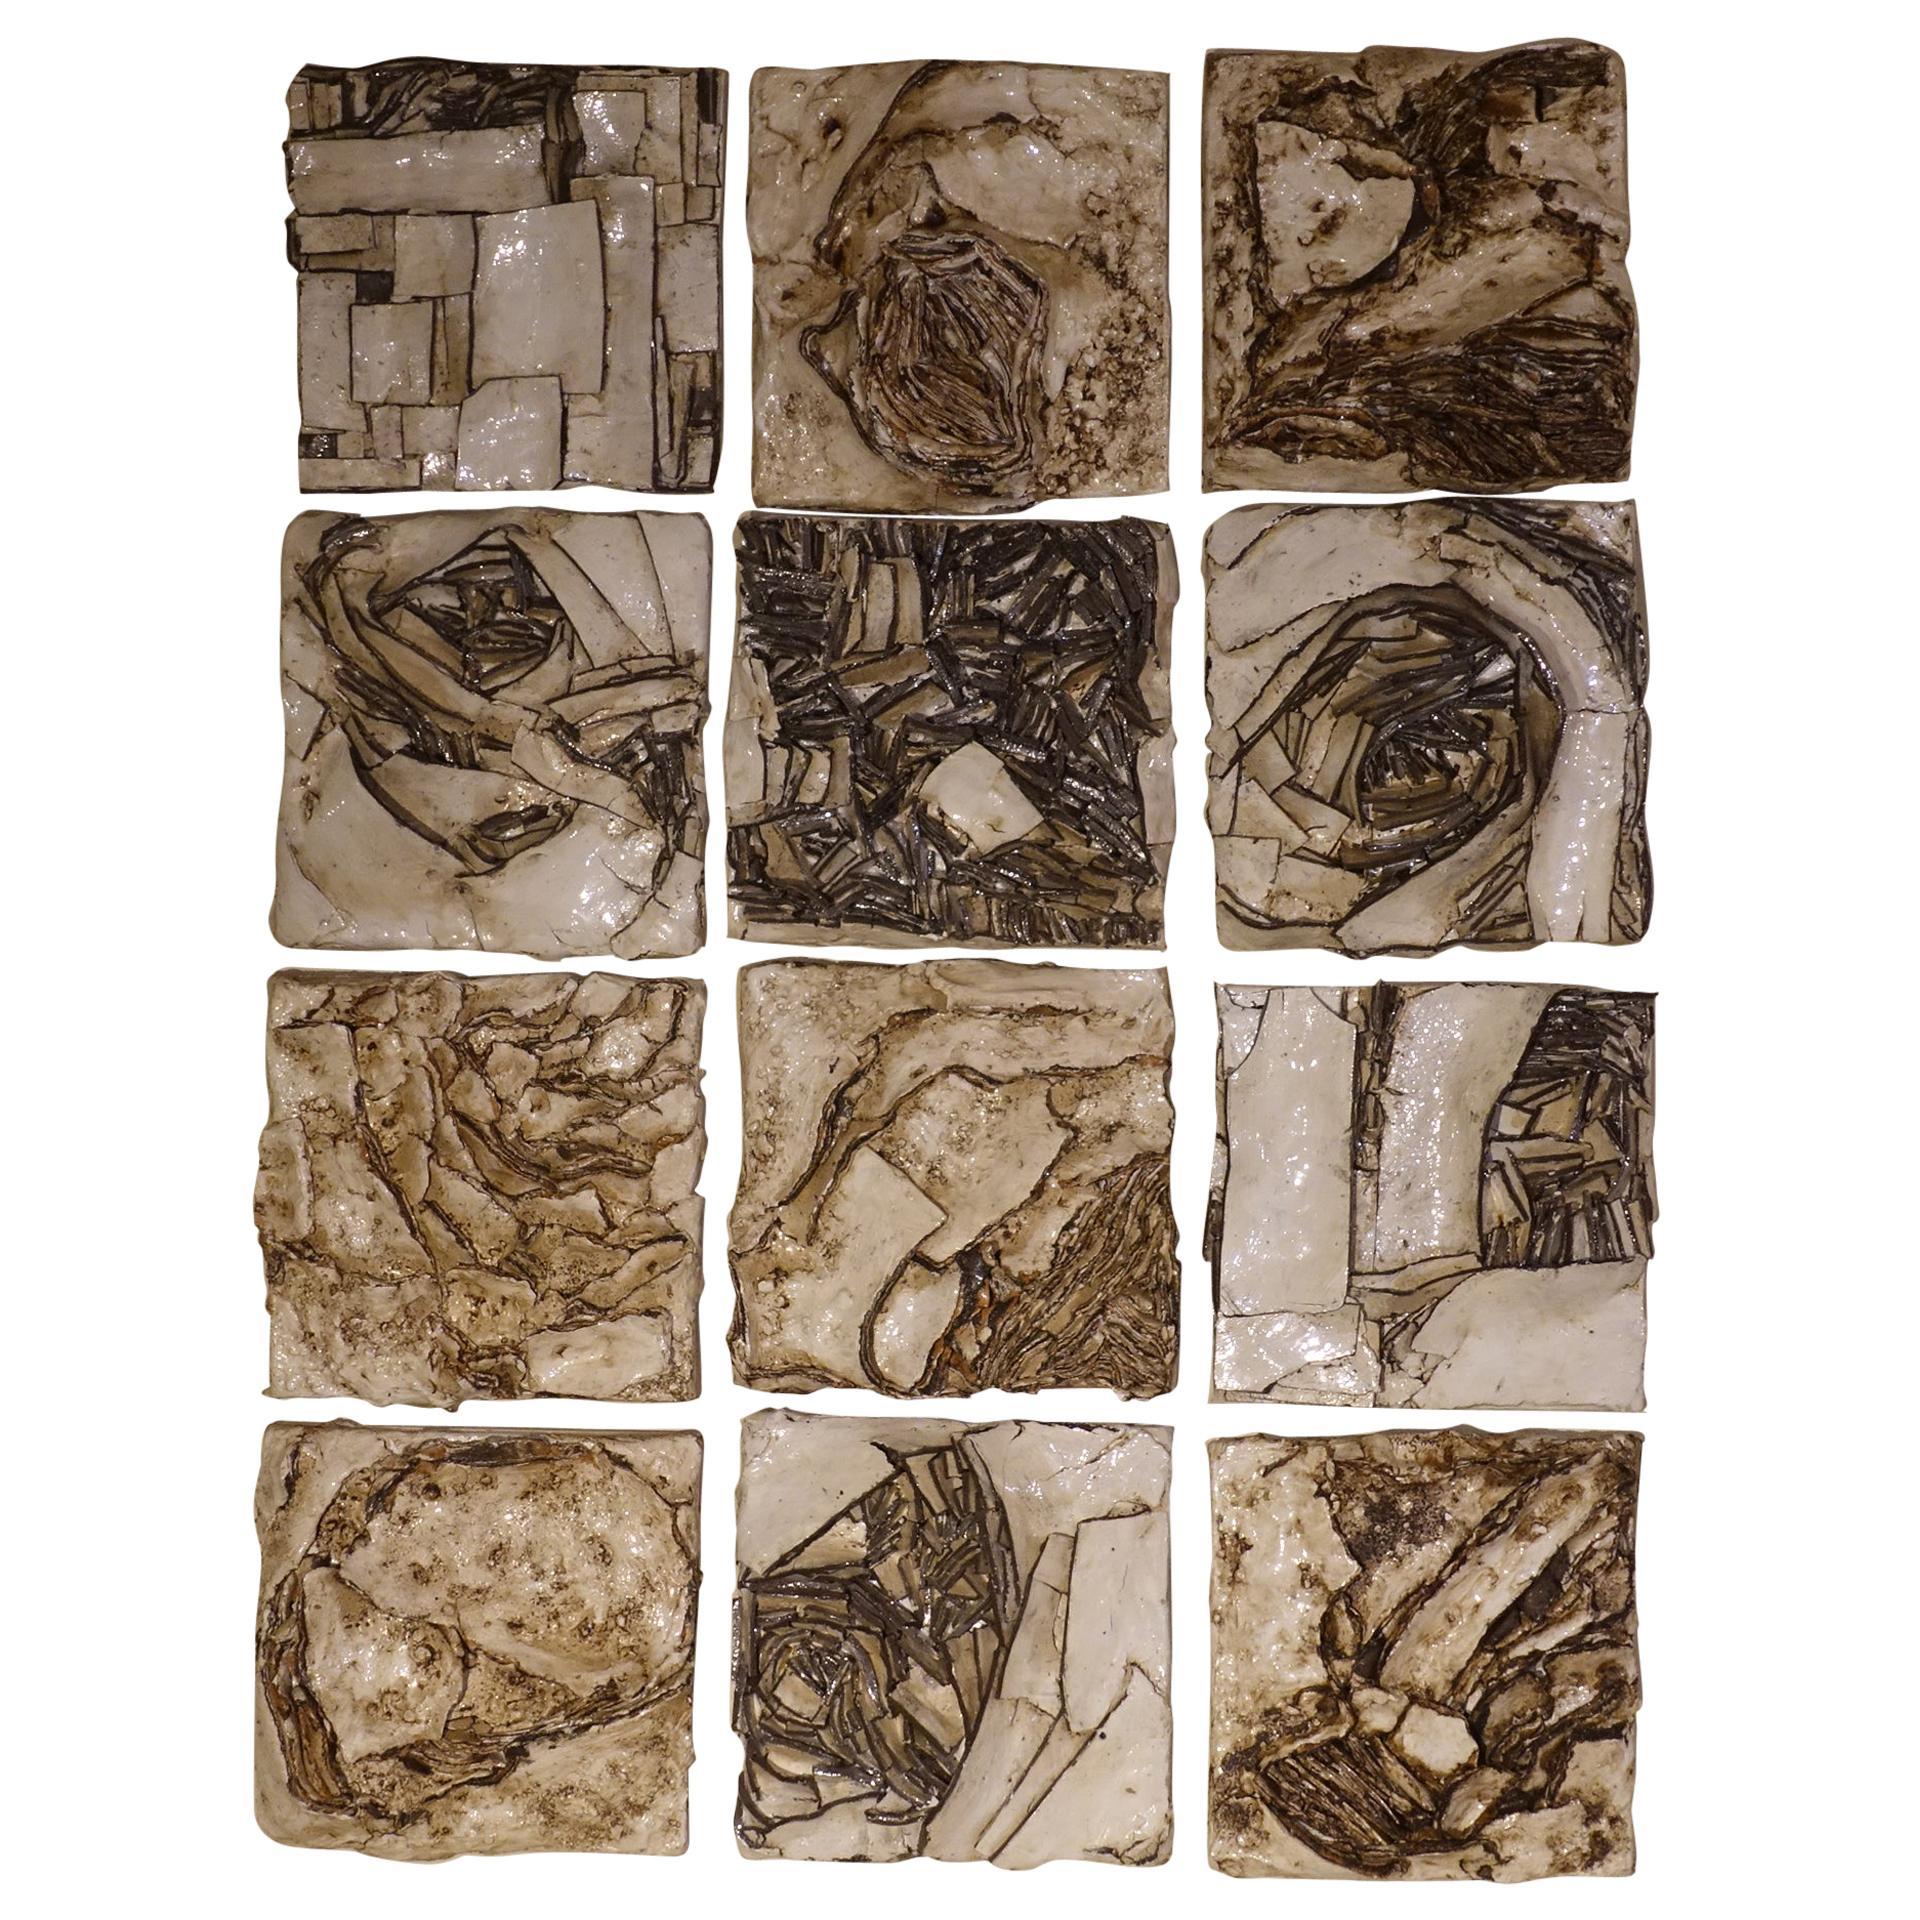 Set of Twelve Abstract Ivory Glazed Ceramic Wall Decorative Art, Italy, 2020